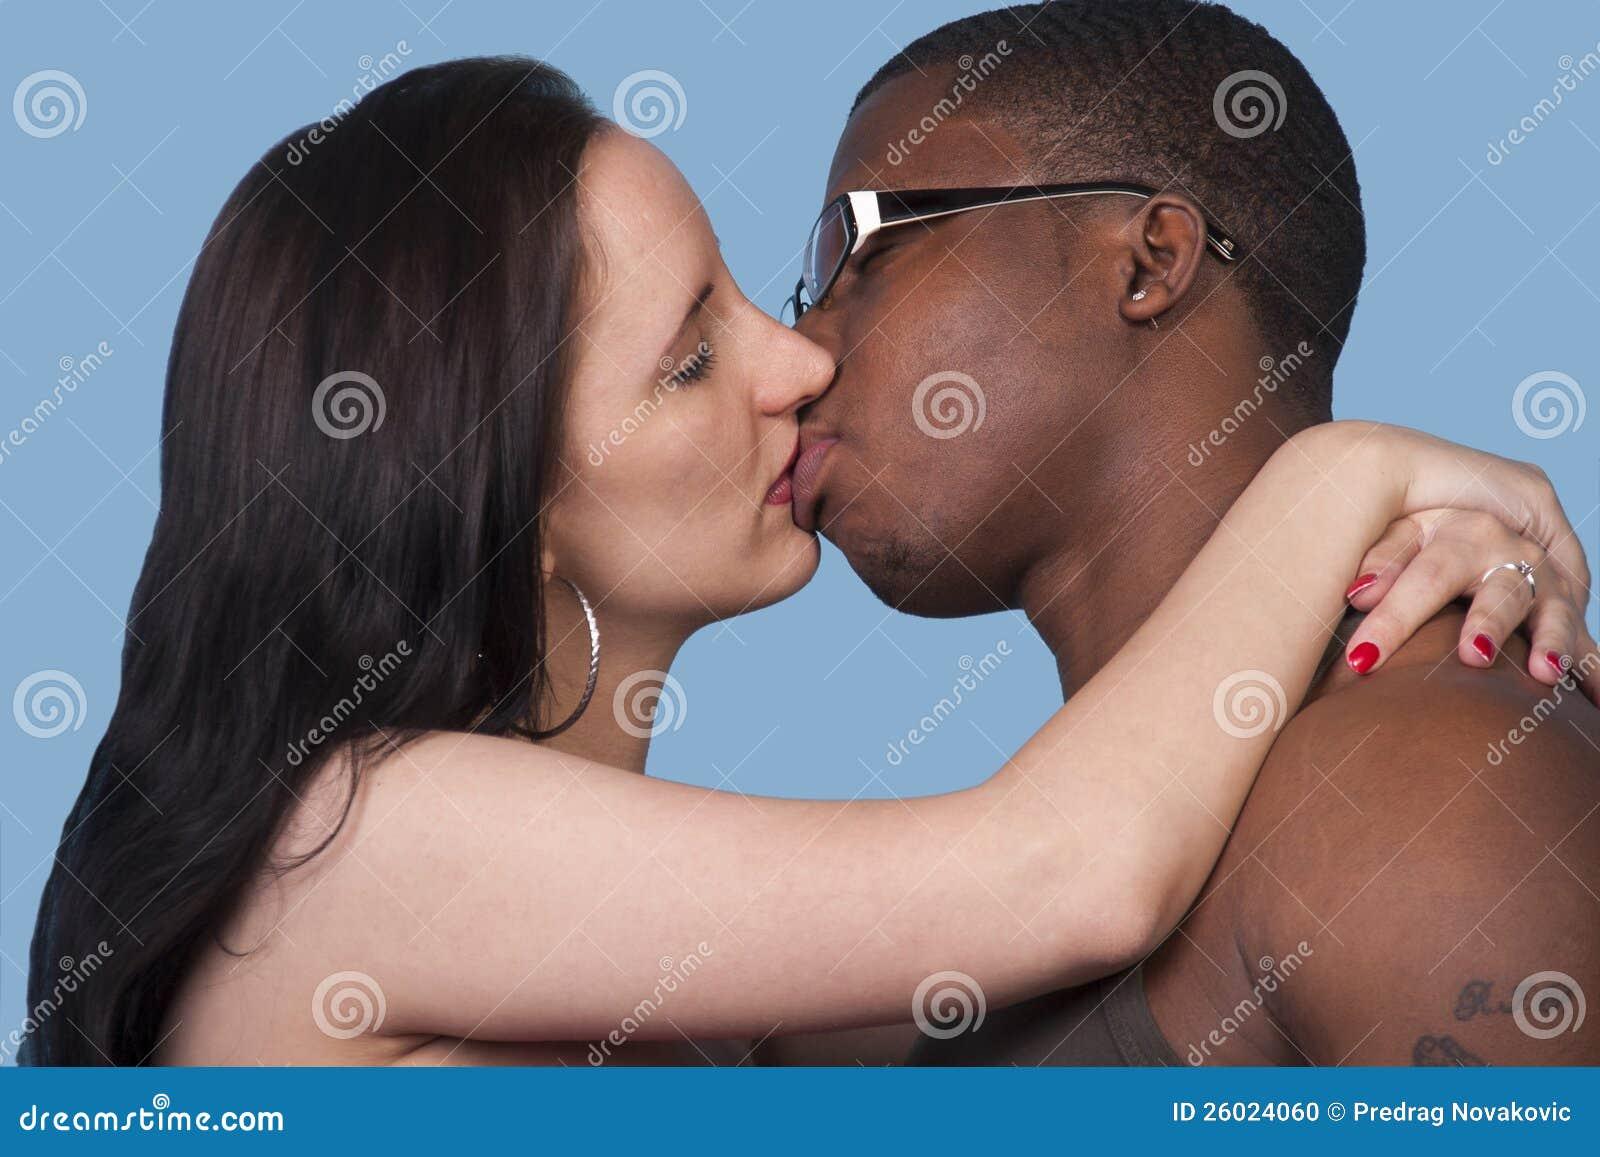 Chica blanca se pone negro interracial